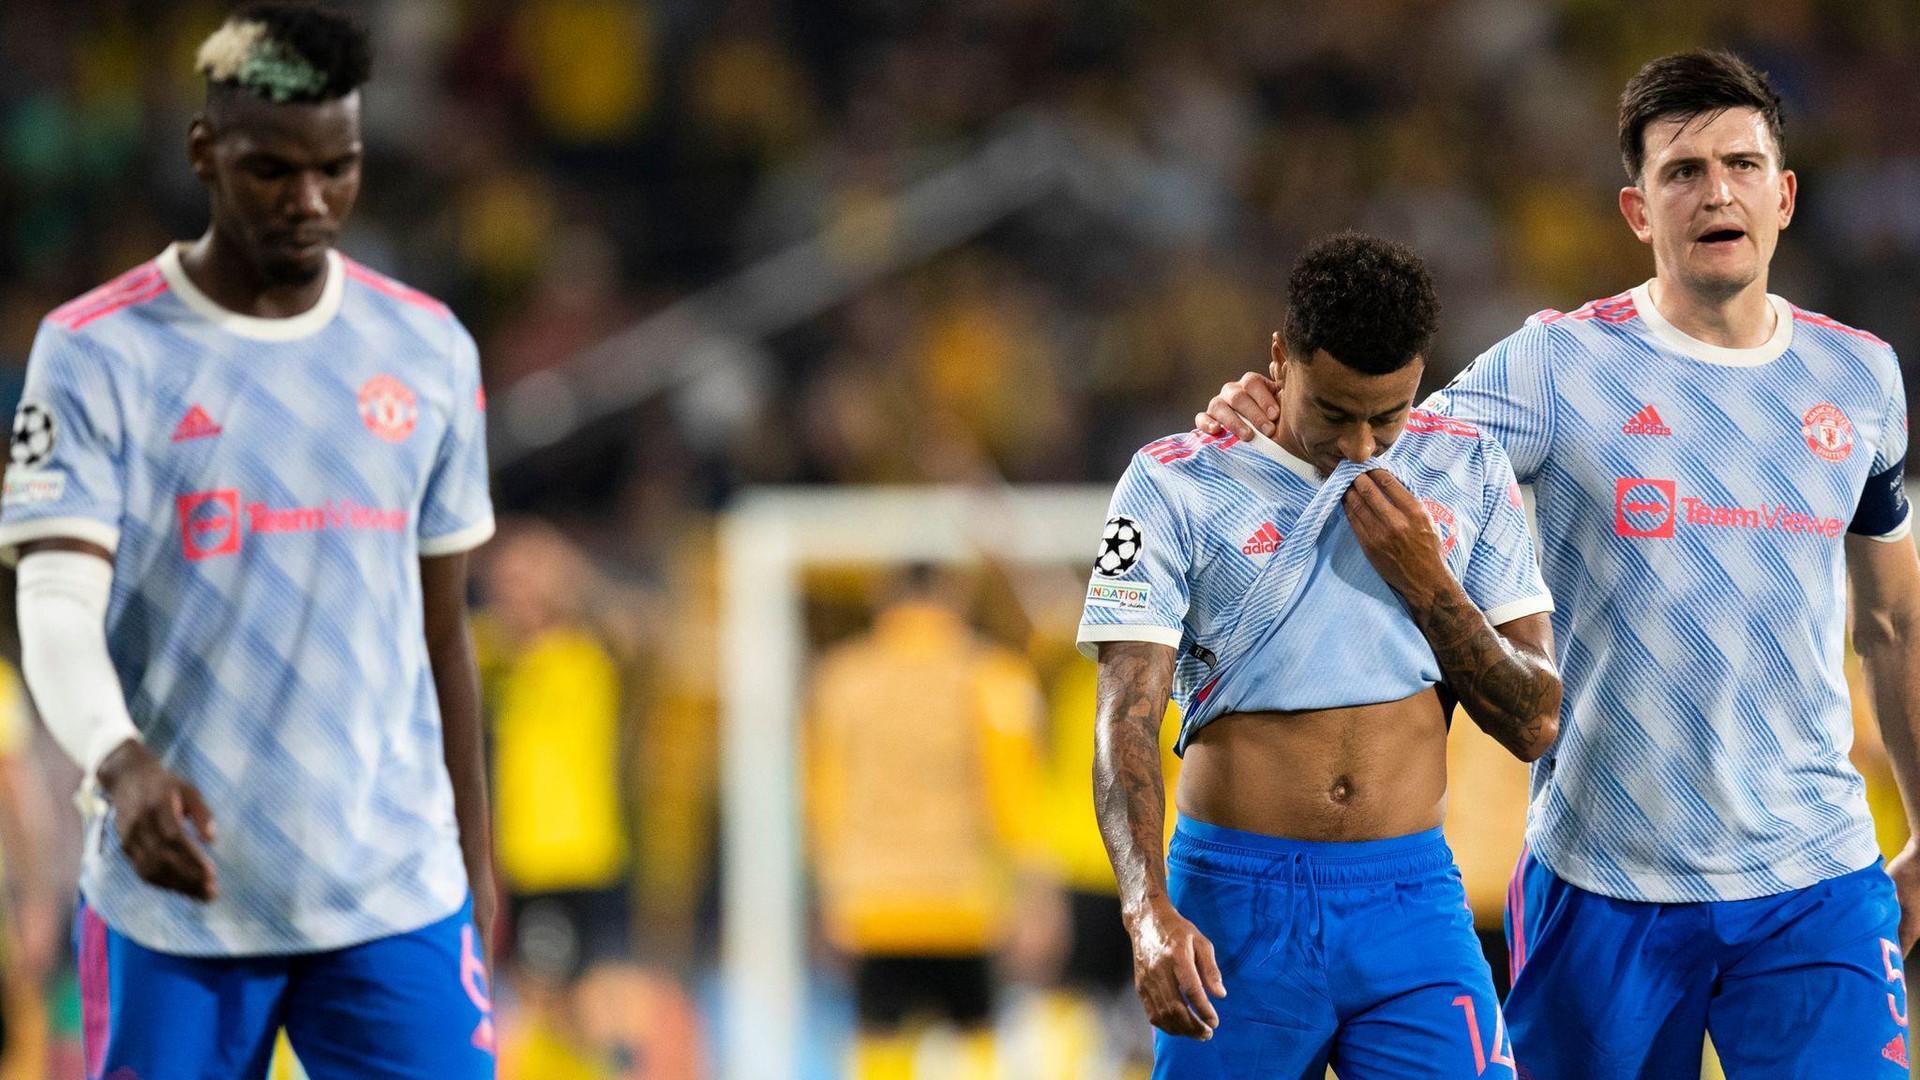 HLV Solskjaer sai lầm khiến Man Utd thua bẽ mặt ở Champions League - 4